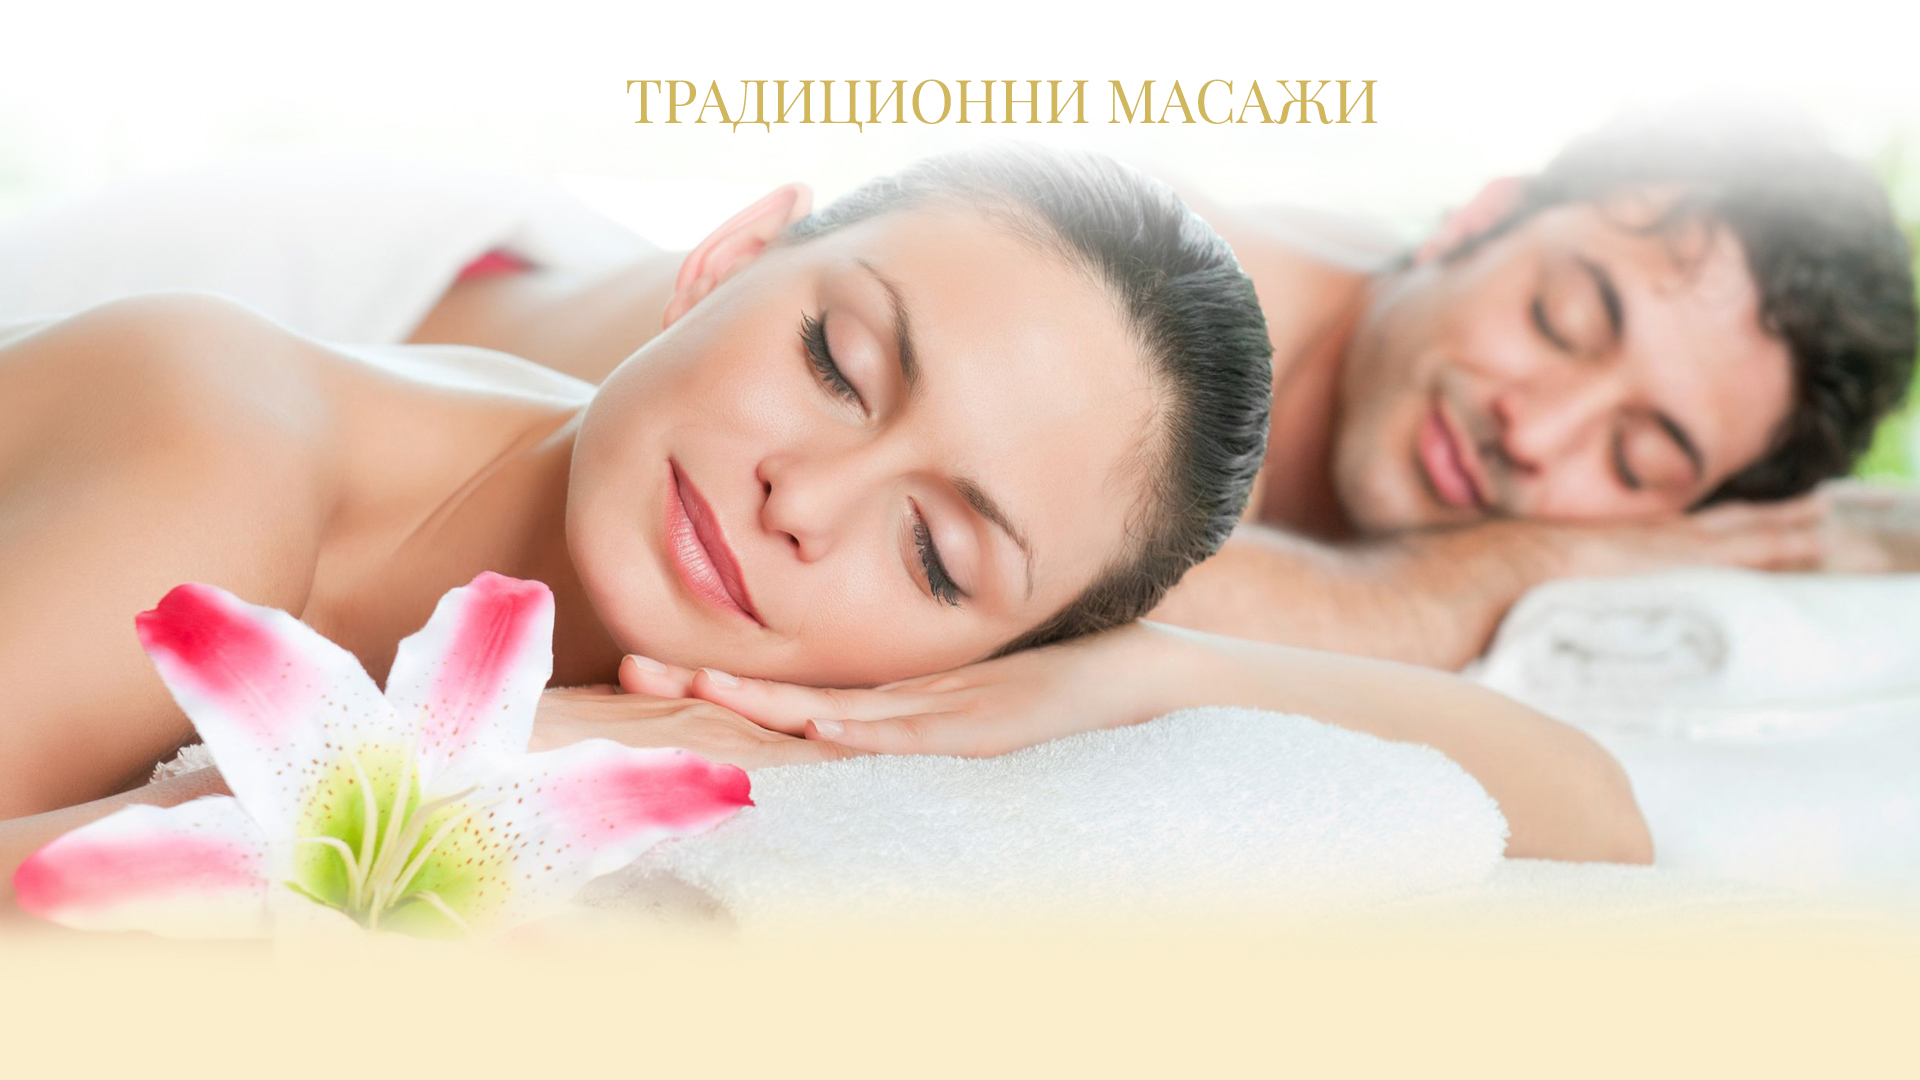 tradicionni-massage